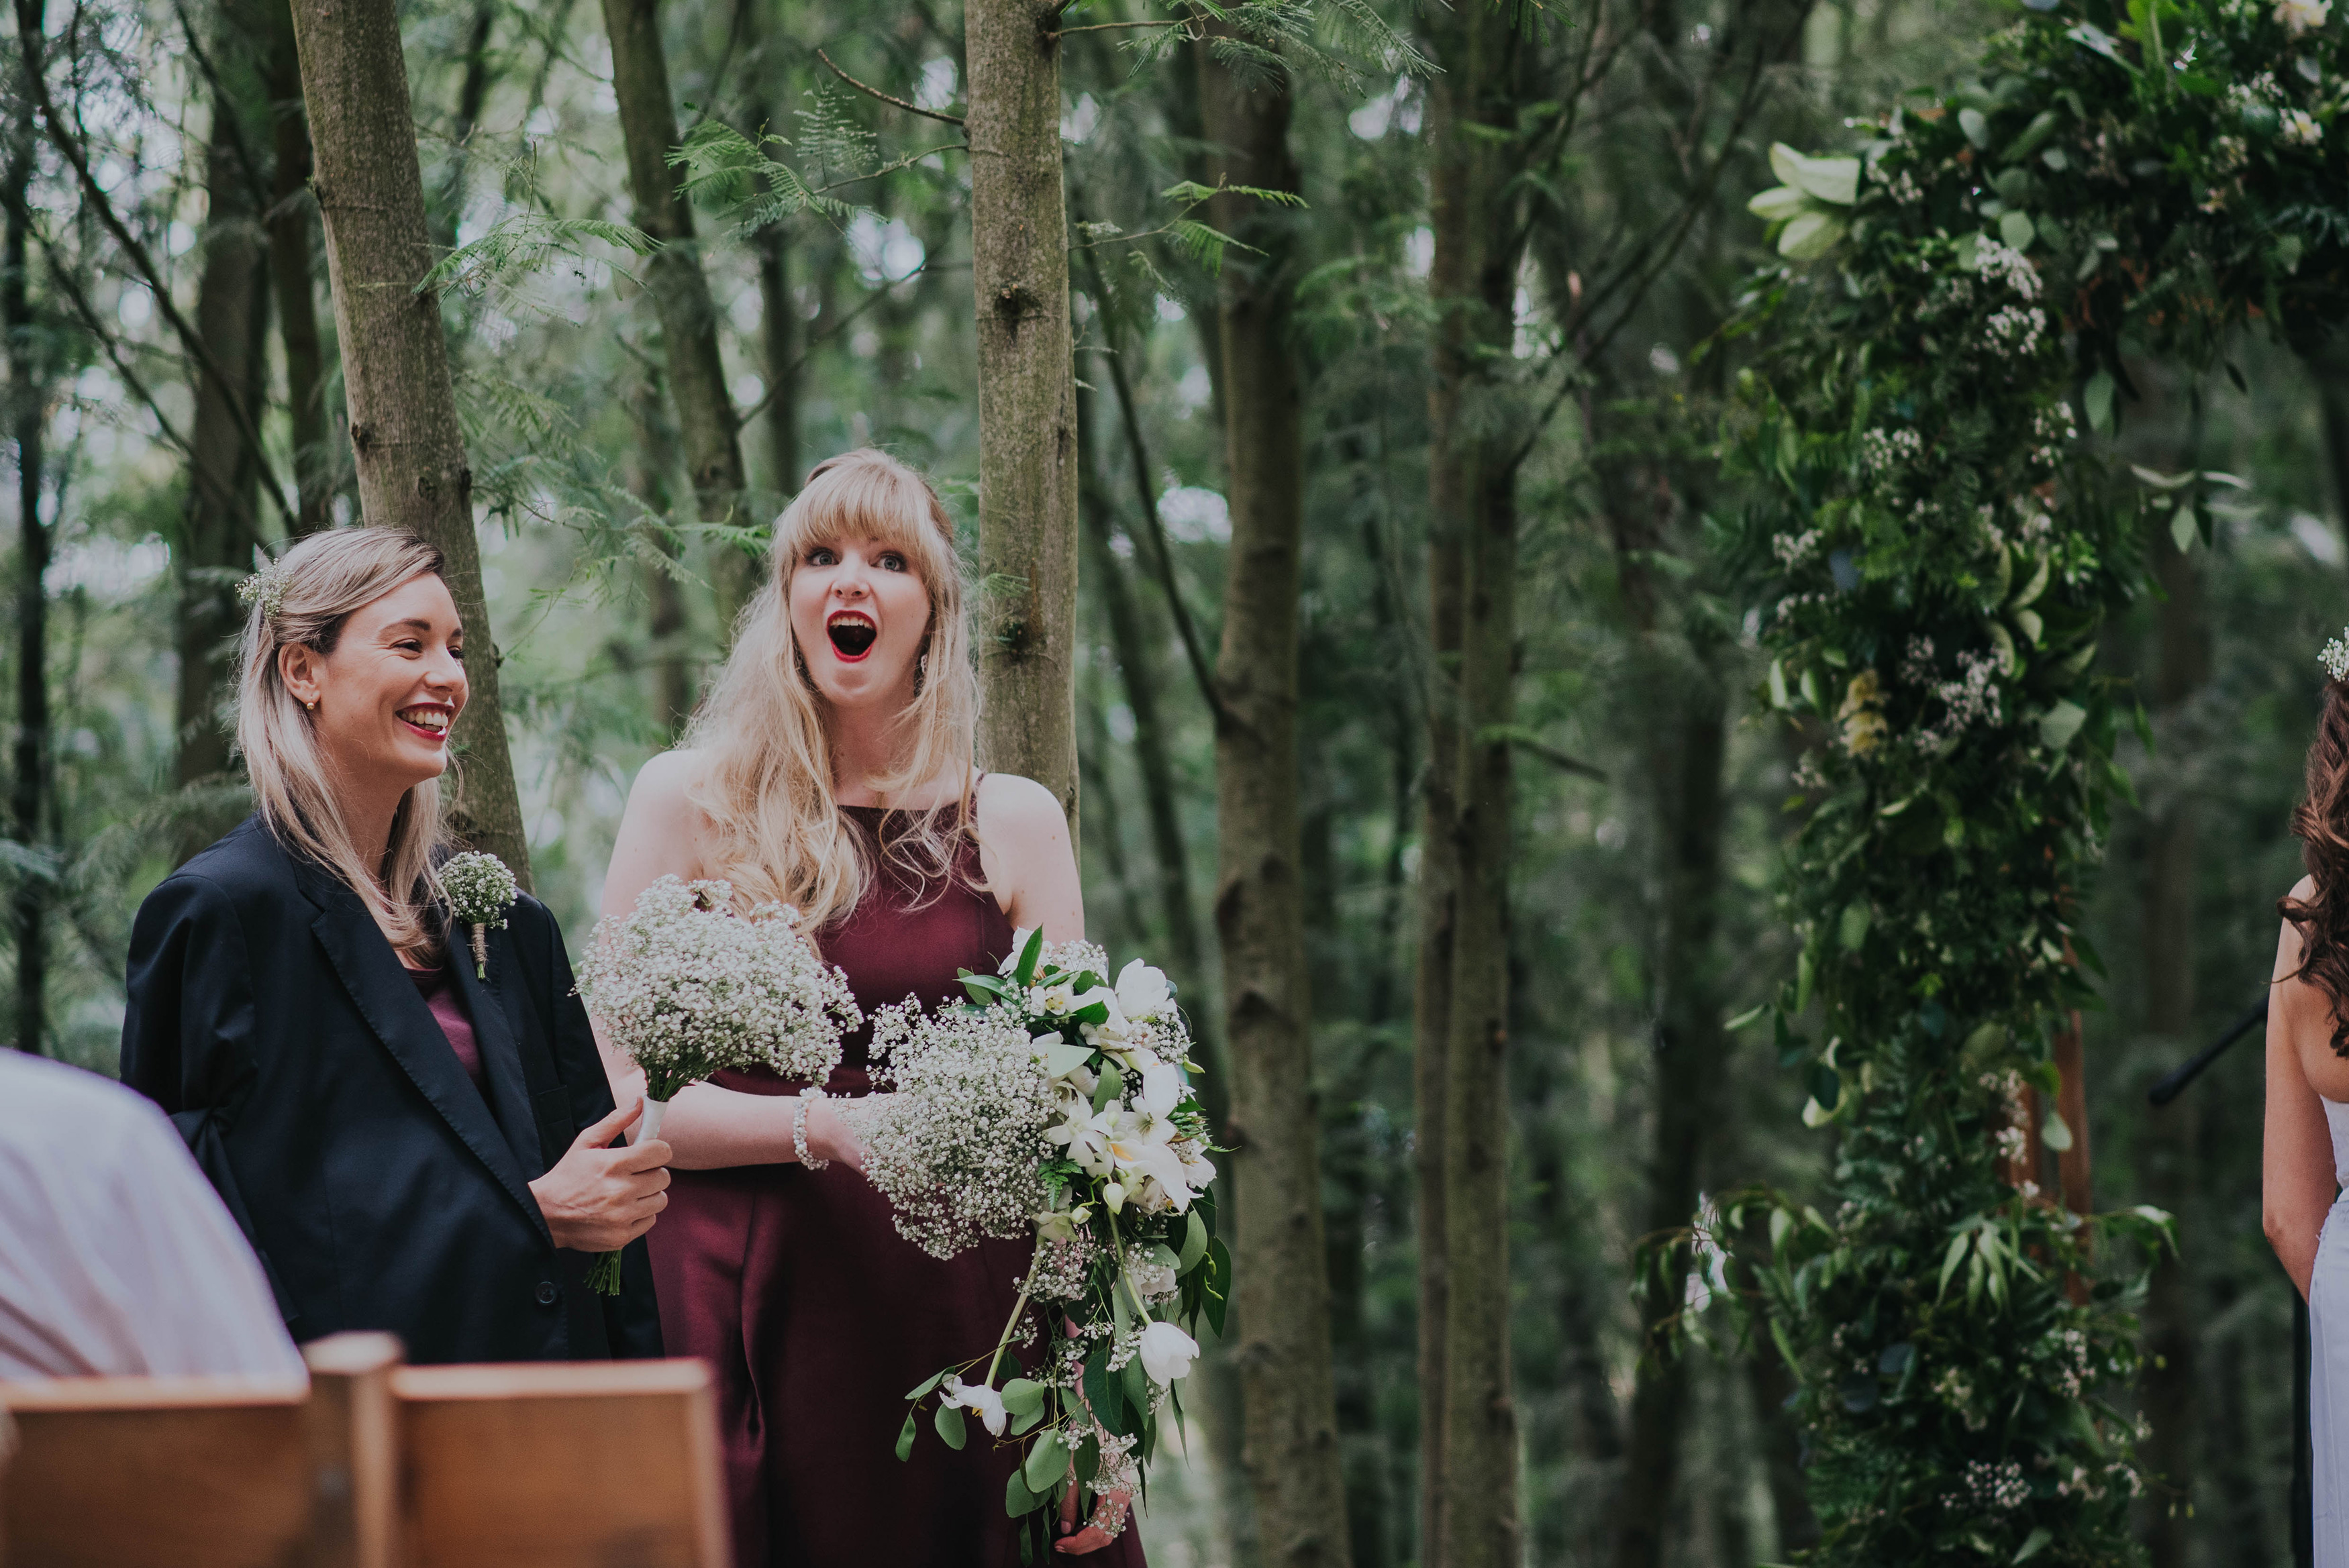 LaurenPretoriusPhotography_Cape Town Wedding Photographer016